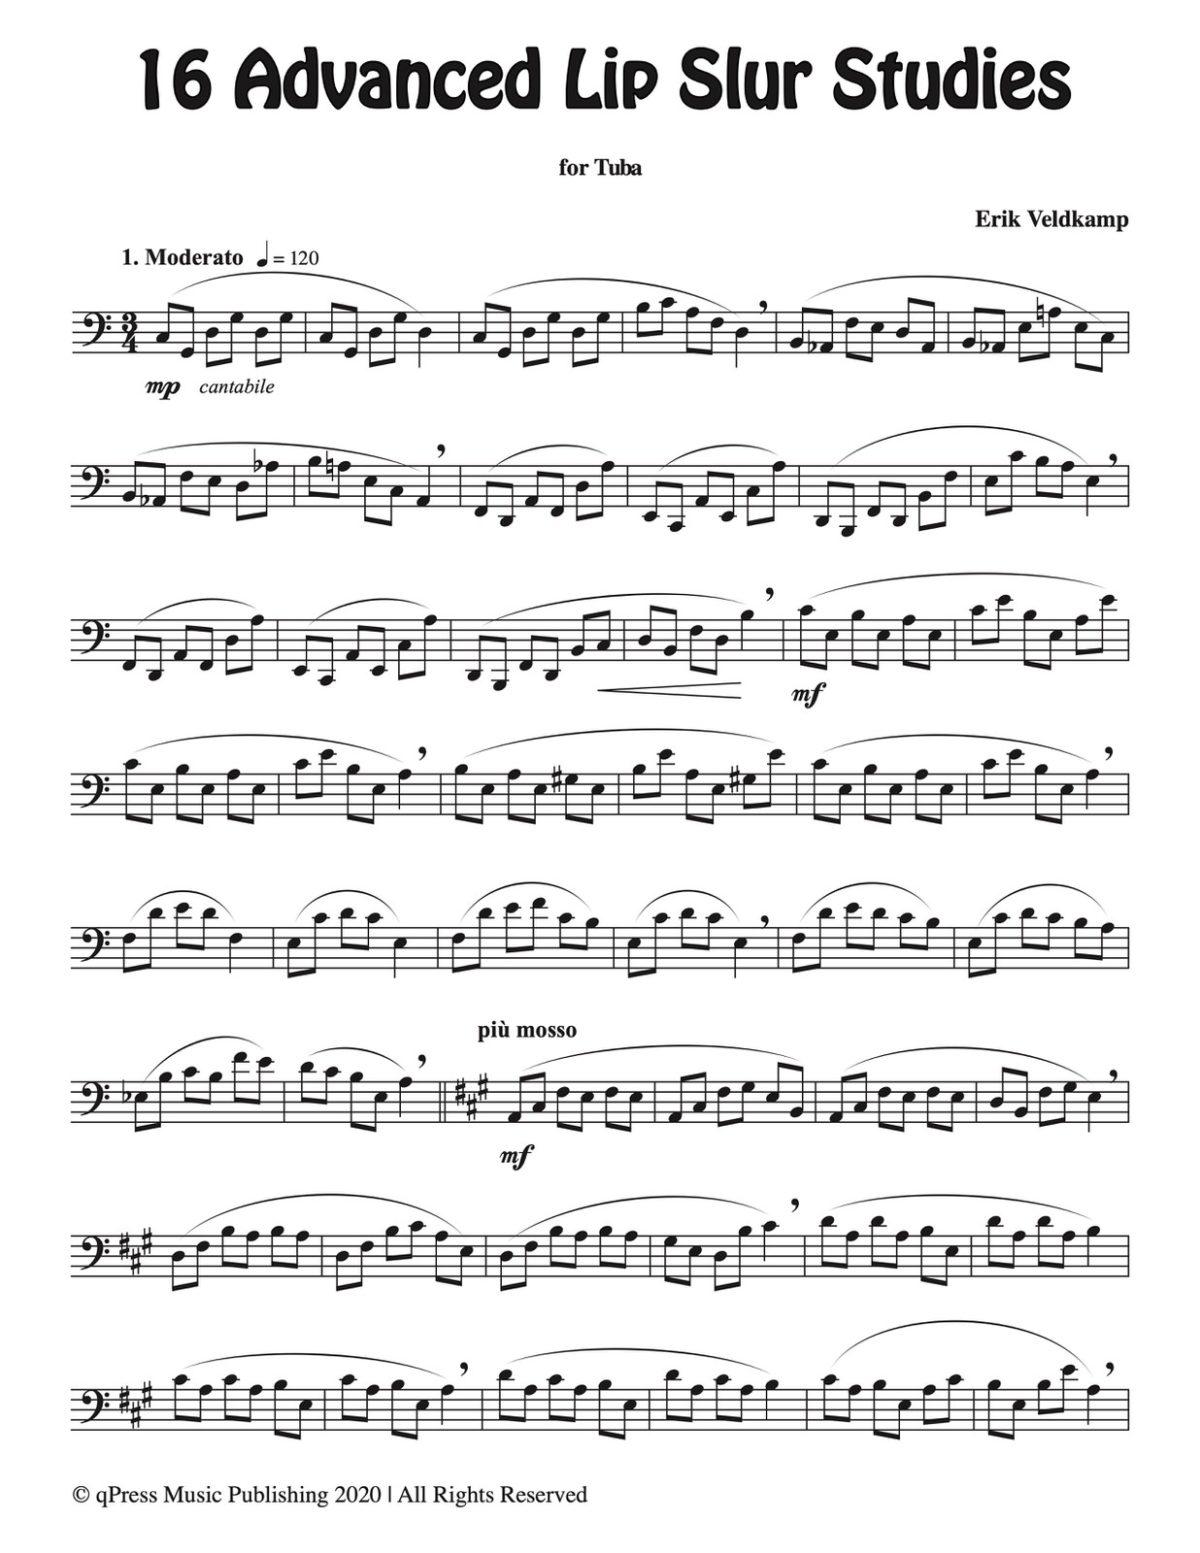 Veldkamp, 16 Advanced Lip Slur Studies for Tuba-p03